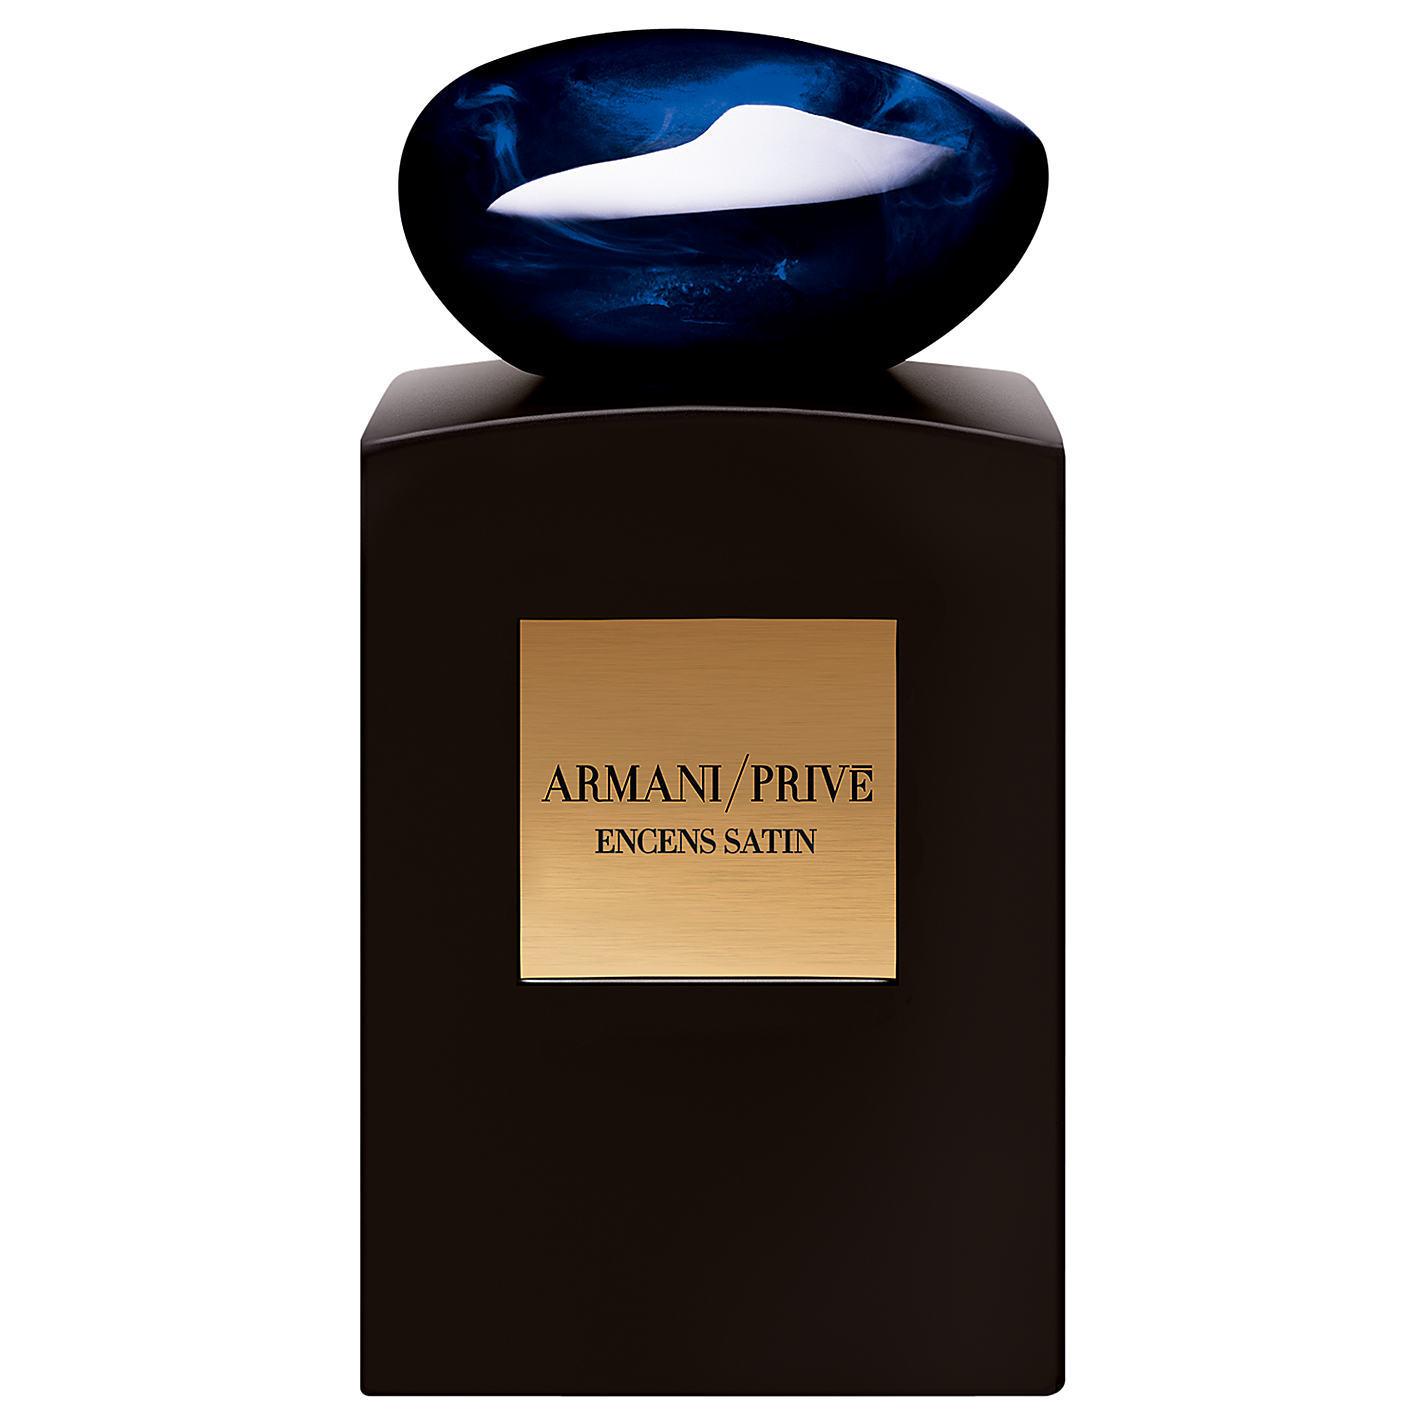 ENCENS SATIN by Armani/Prive 5ml Travel Spray EDP Perfume INCENSE AMBER PEPPER